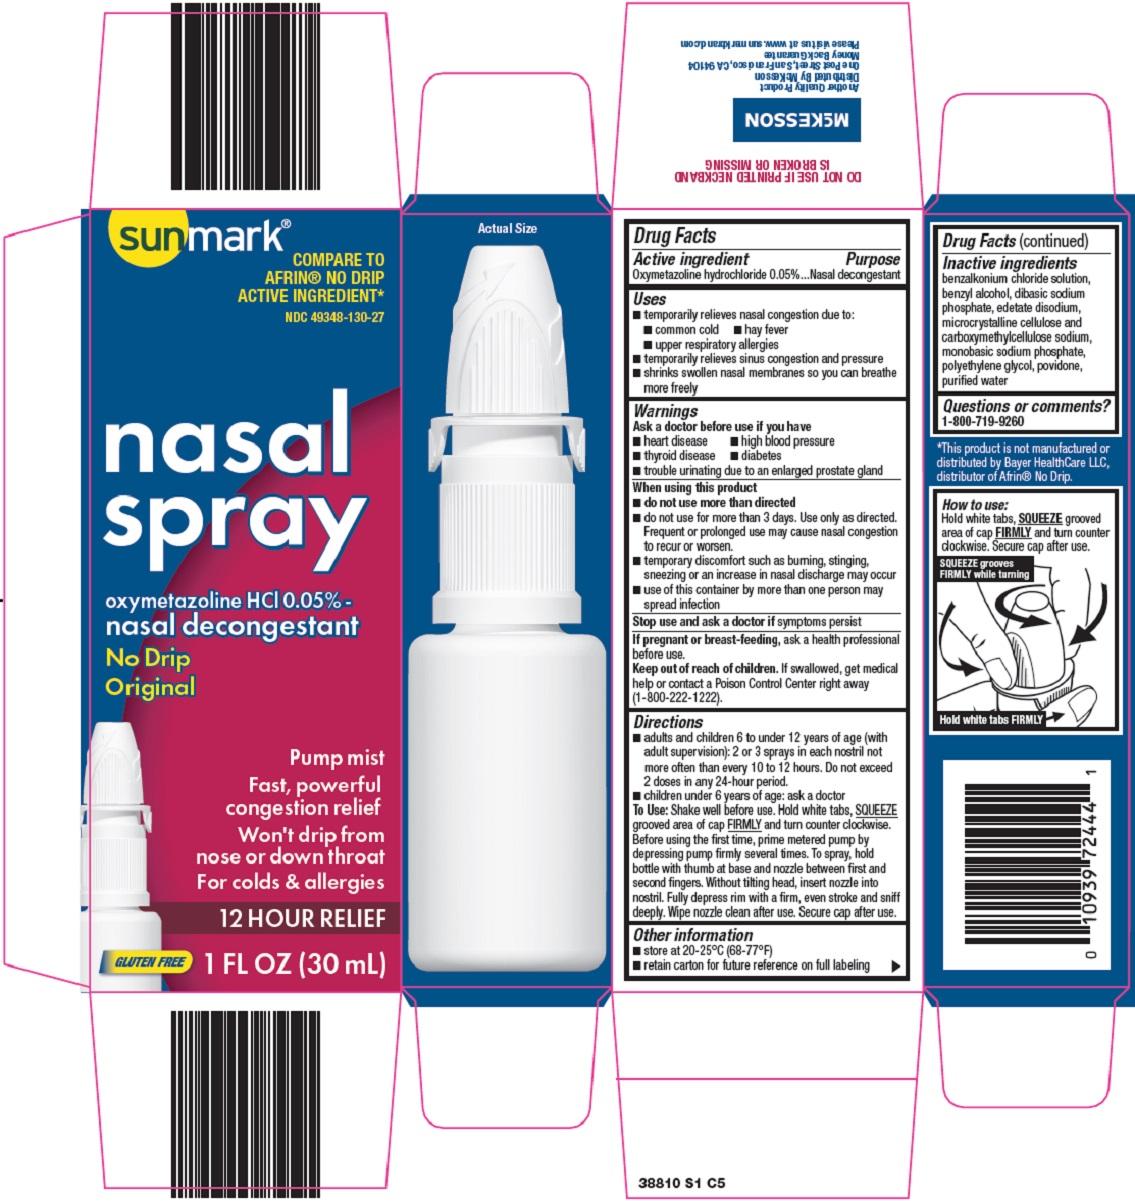 nasal-spray-image